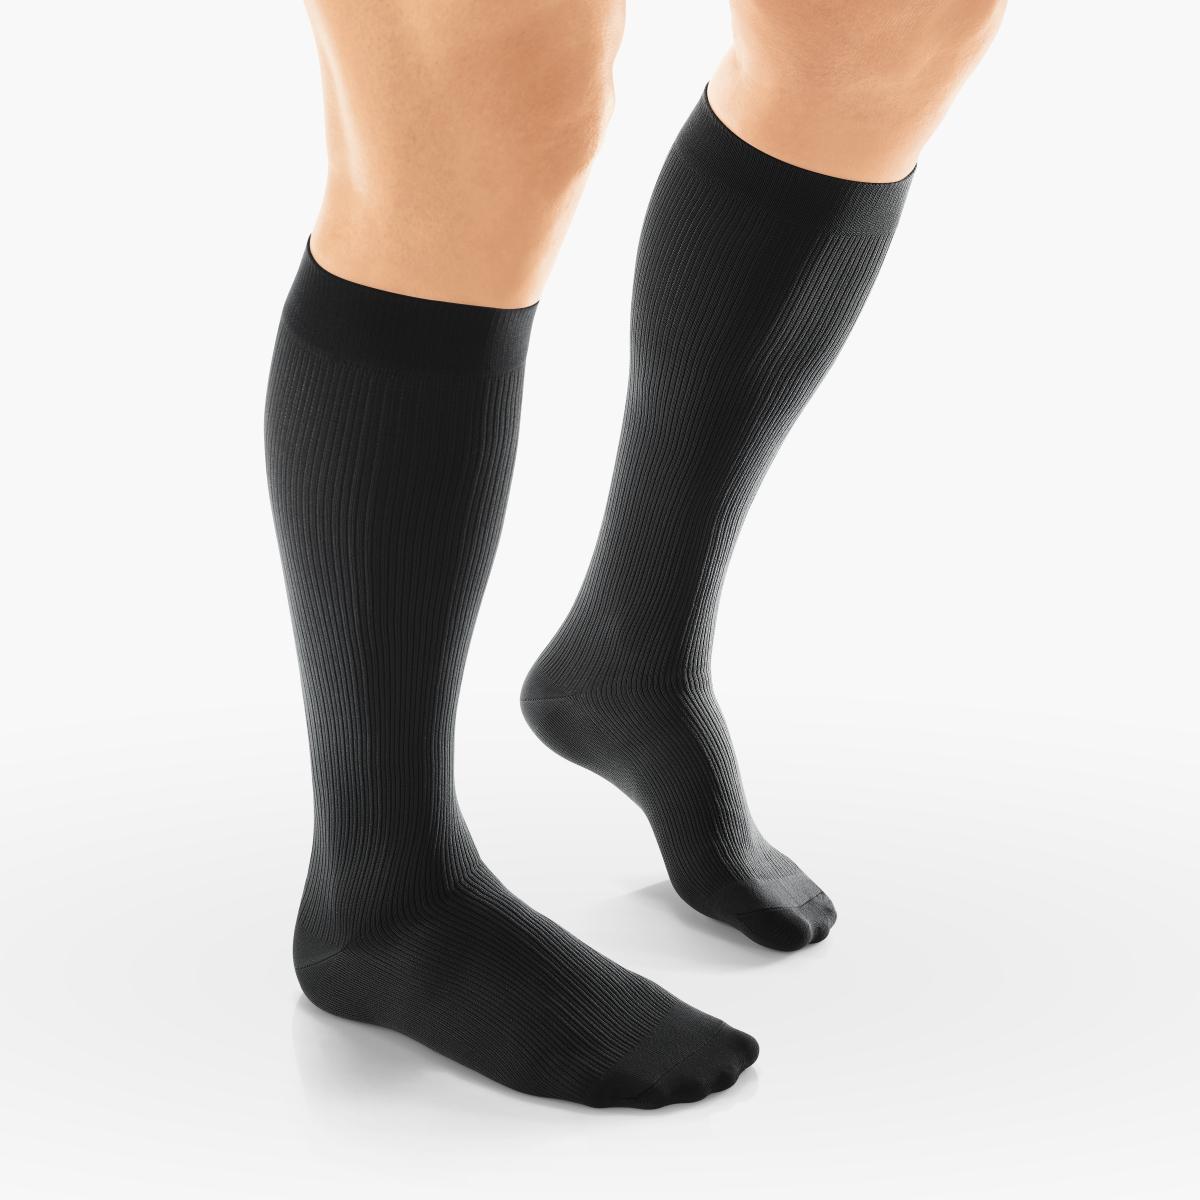 VENOSAN Sup F Men, Business, Below Knee 20-30, Black, M Firm 20-30 mmHg   Black   M      Closed Toe   Knit Top